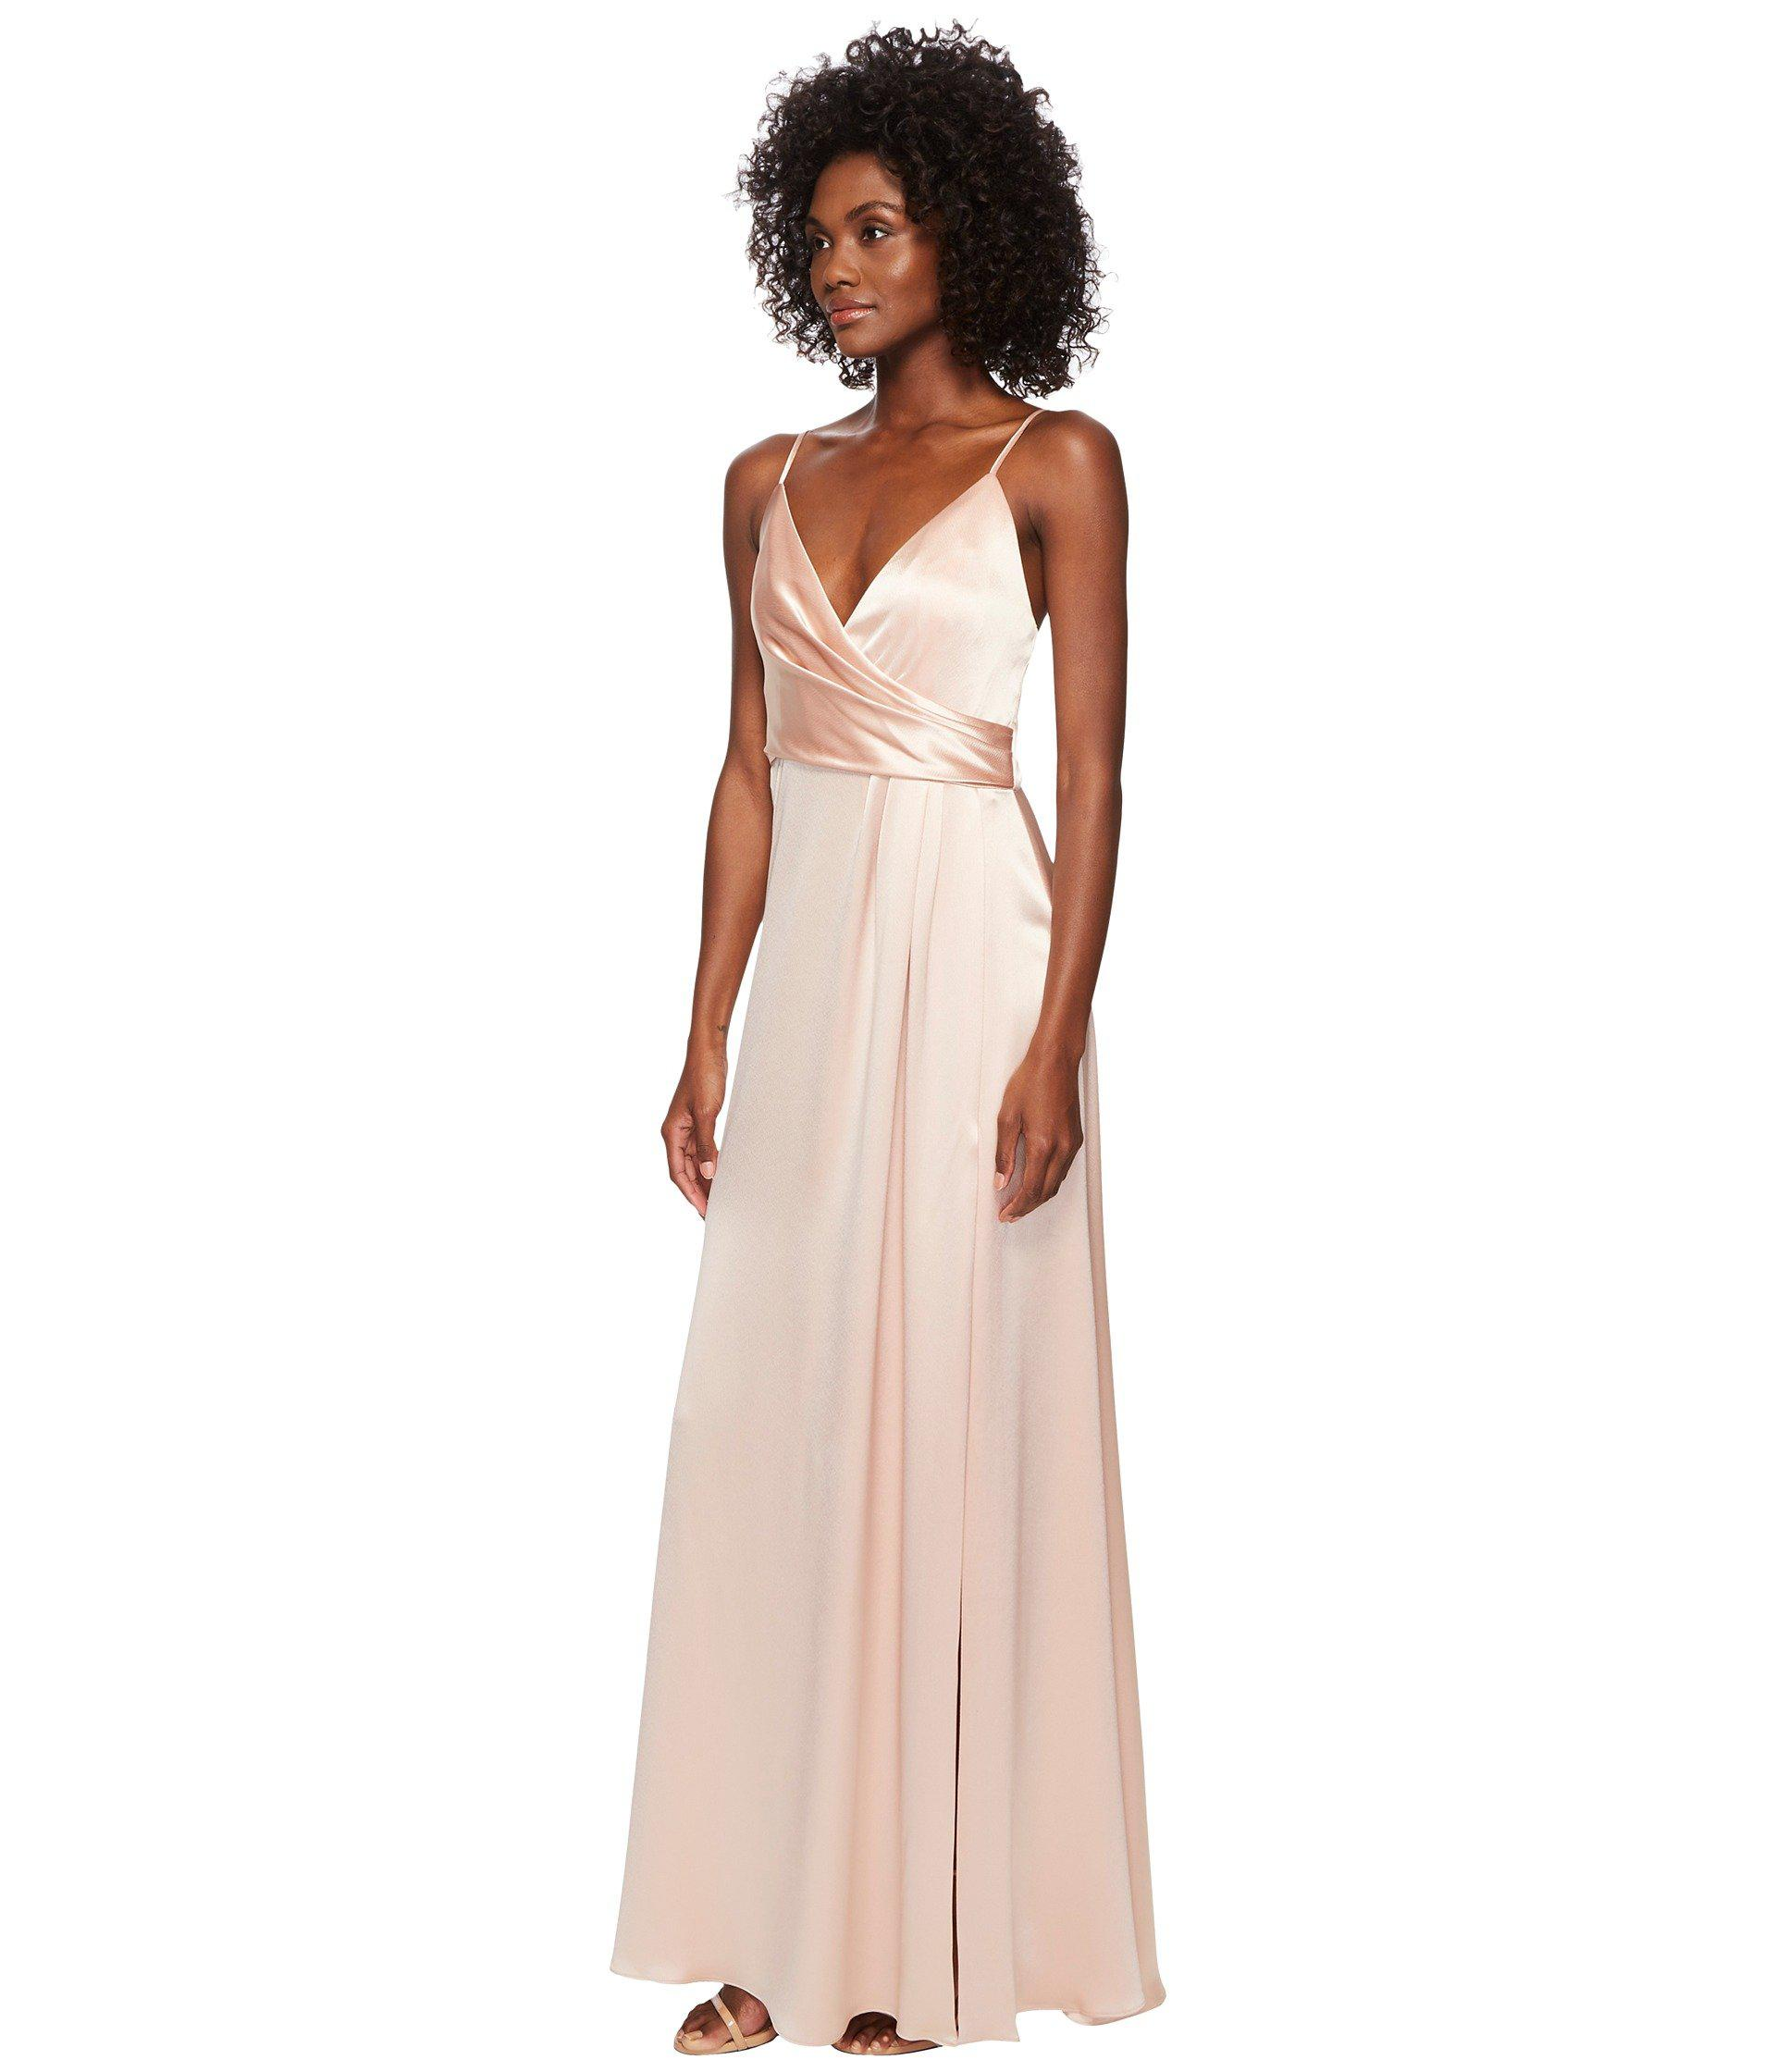 61d57810dcd51 Lyst - JILL Jill Stuart Satin Back Crepe Slip Dress - Save  57.189542483660134%